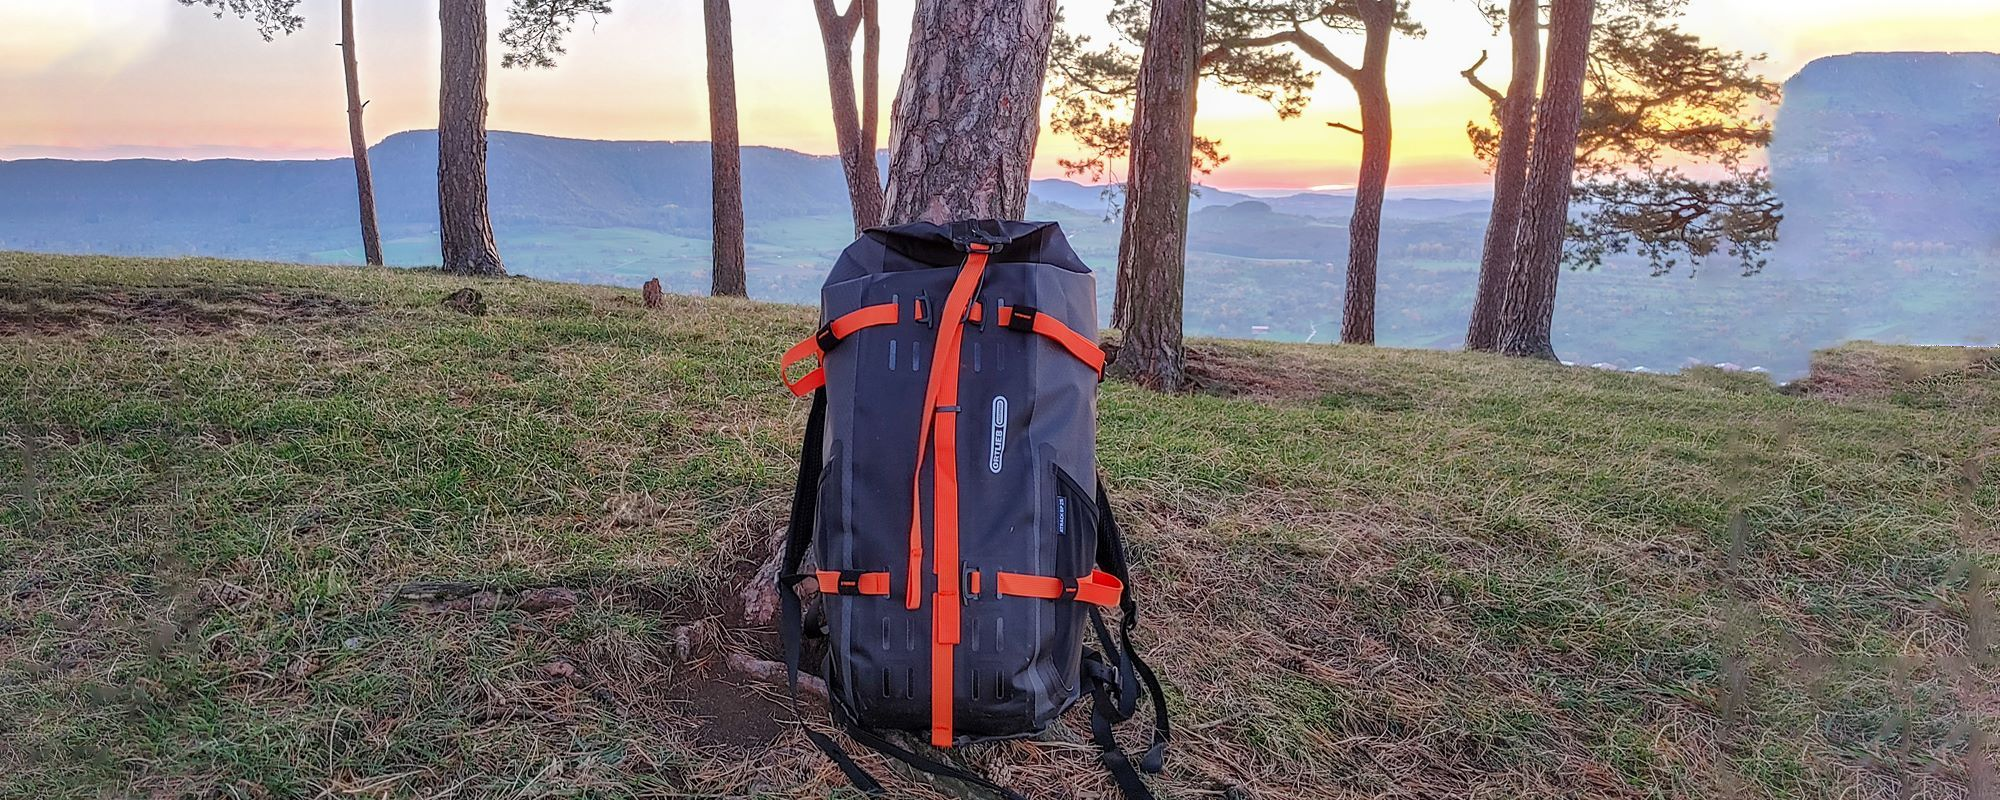 Ortlieb Atrack BP Test (Waterproof & Made in Germany) - Does the bikepacking backpack concept work?